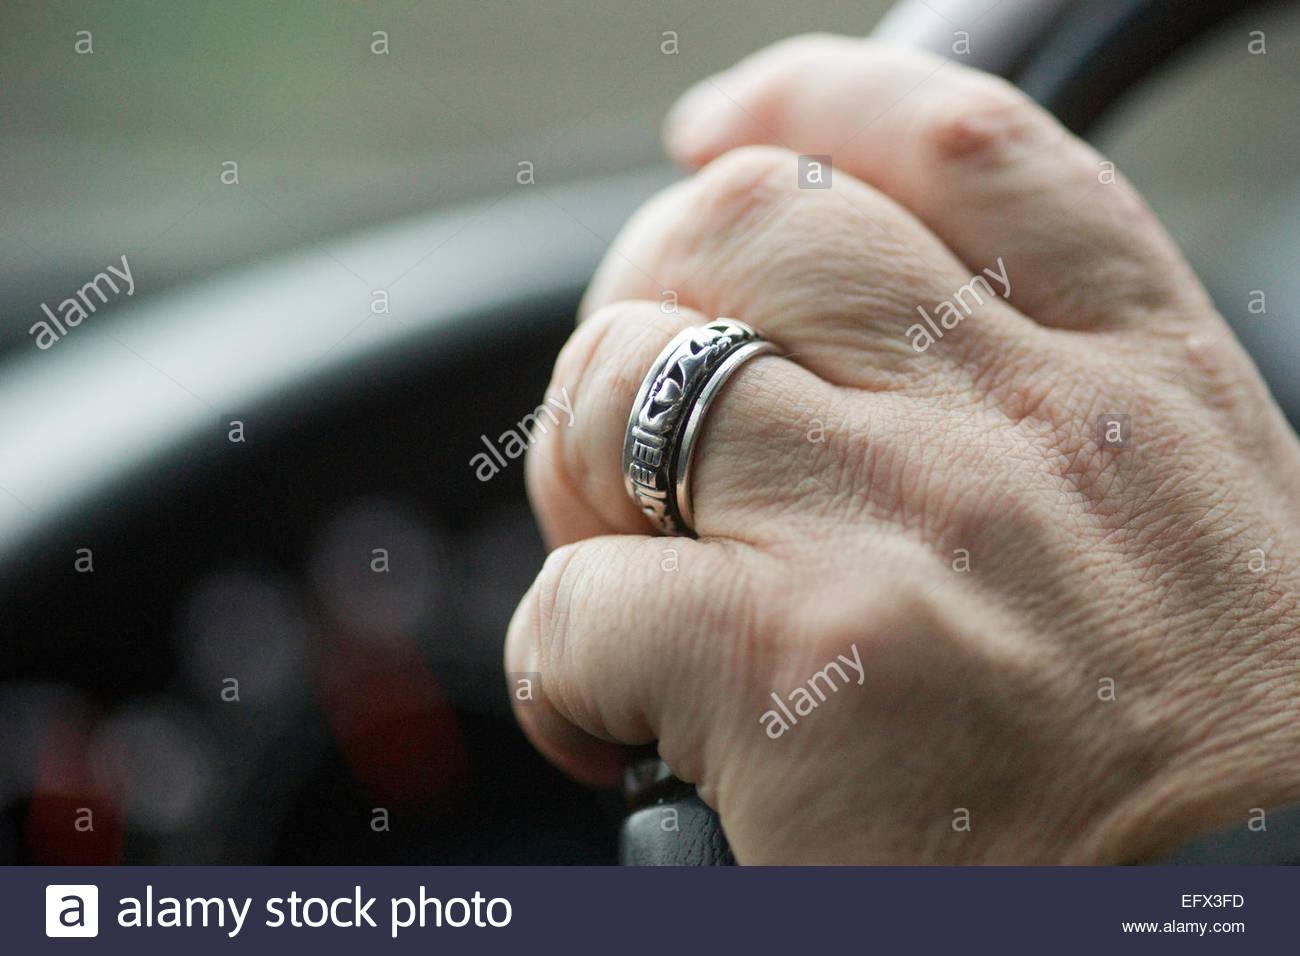 Wedding Ring Steering Wheel Mans Hand Mercedes Benz 500 Series Car